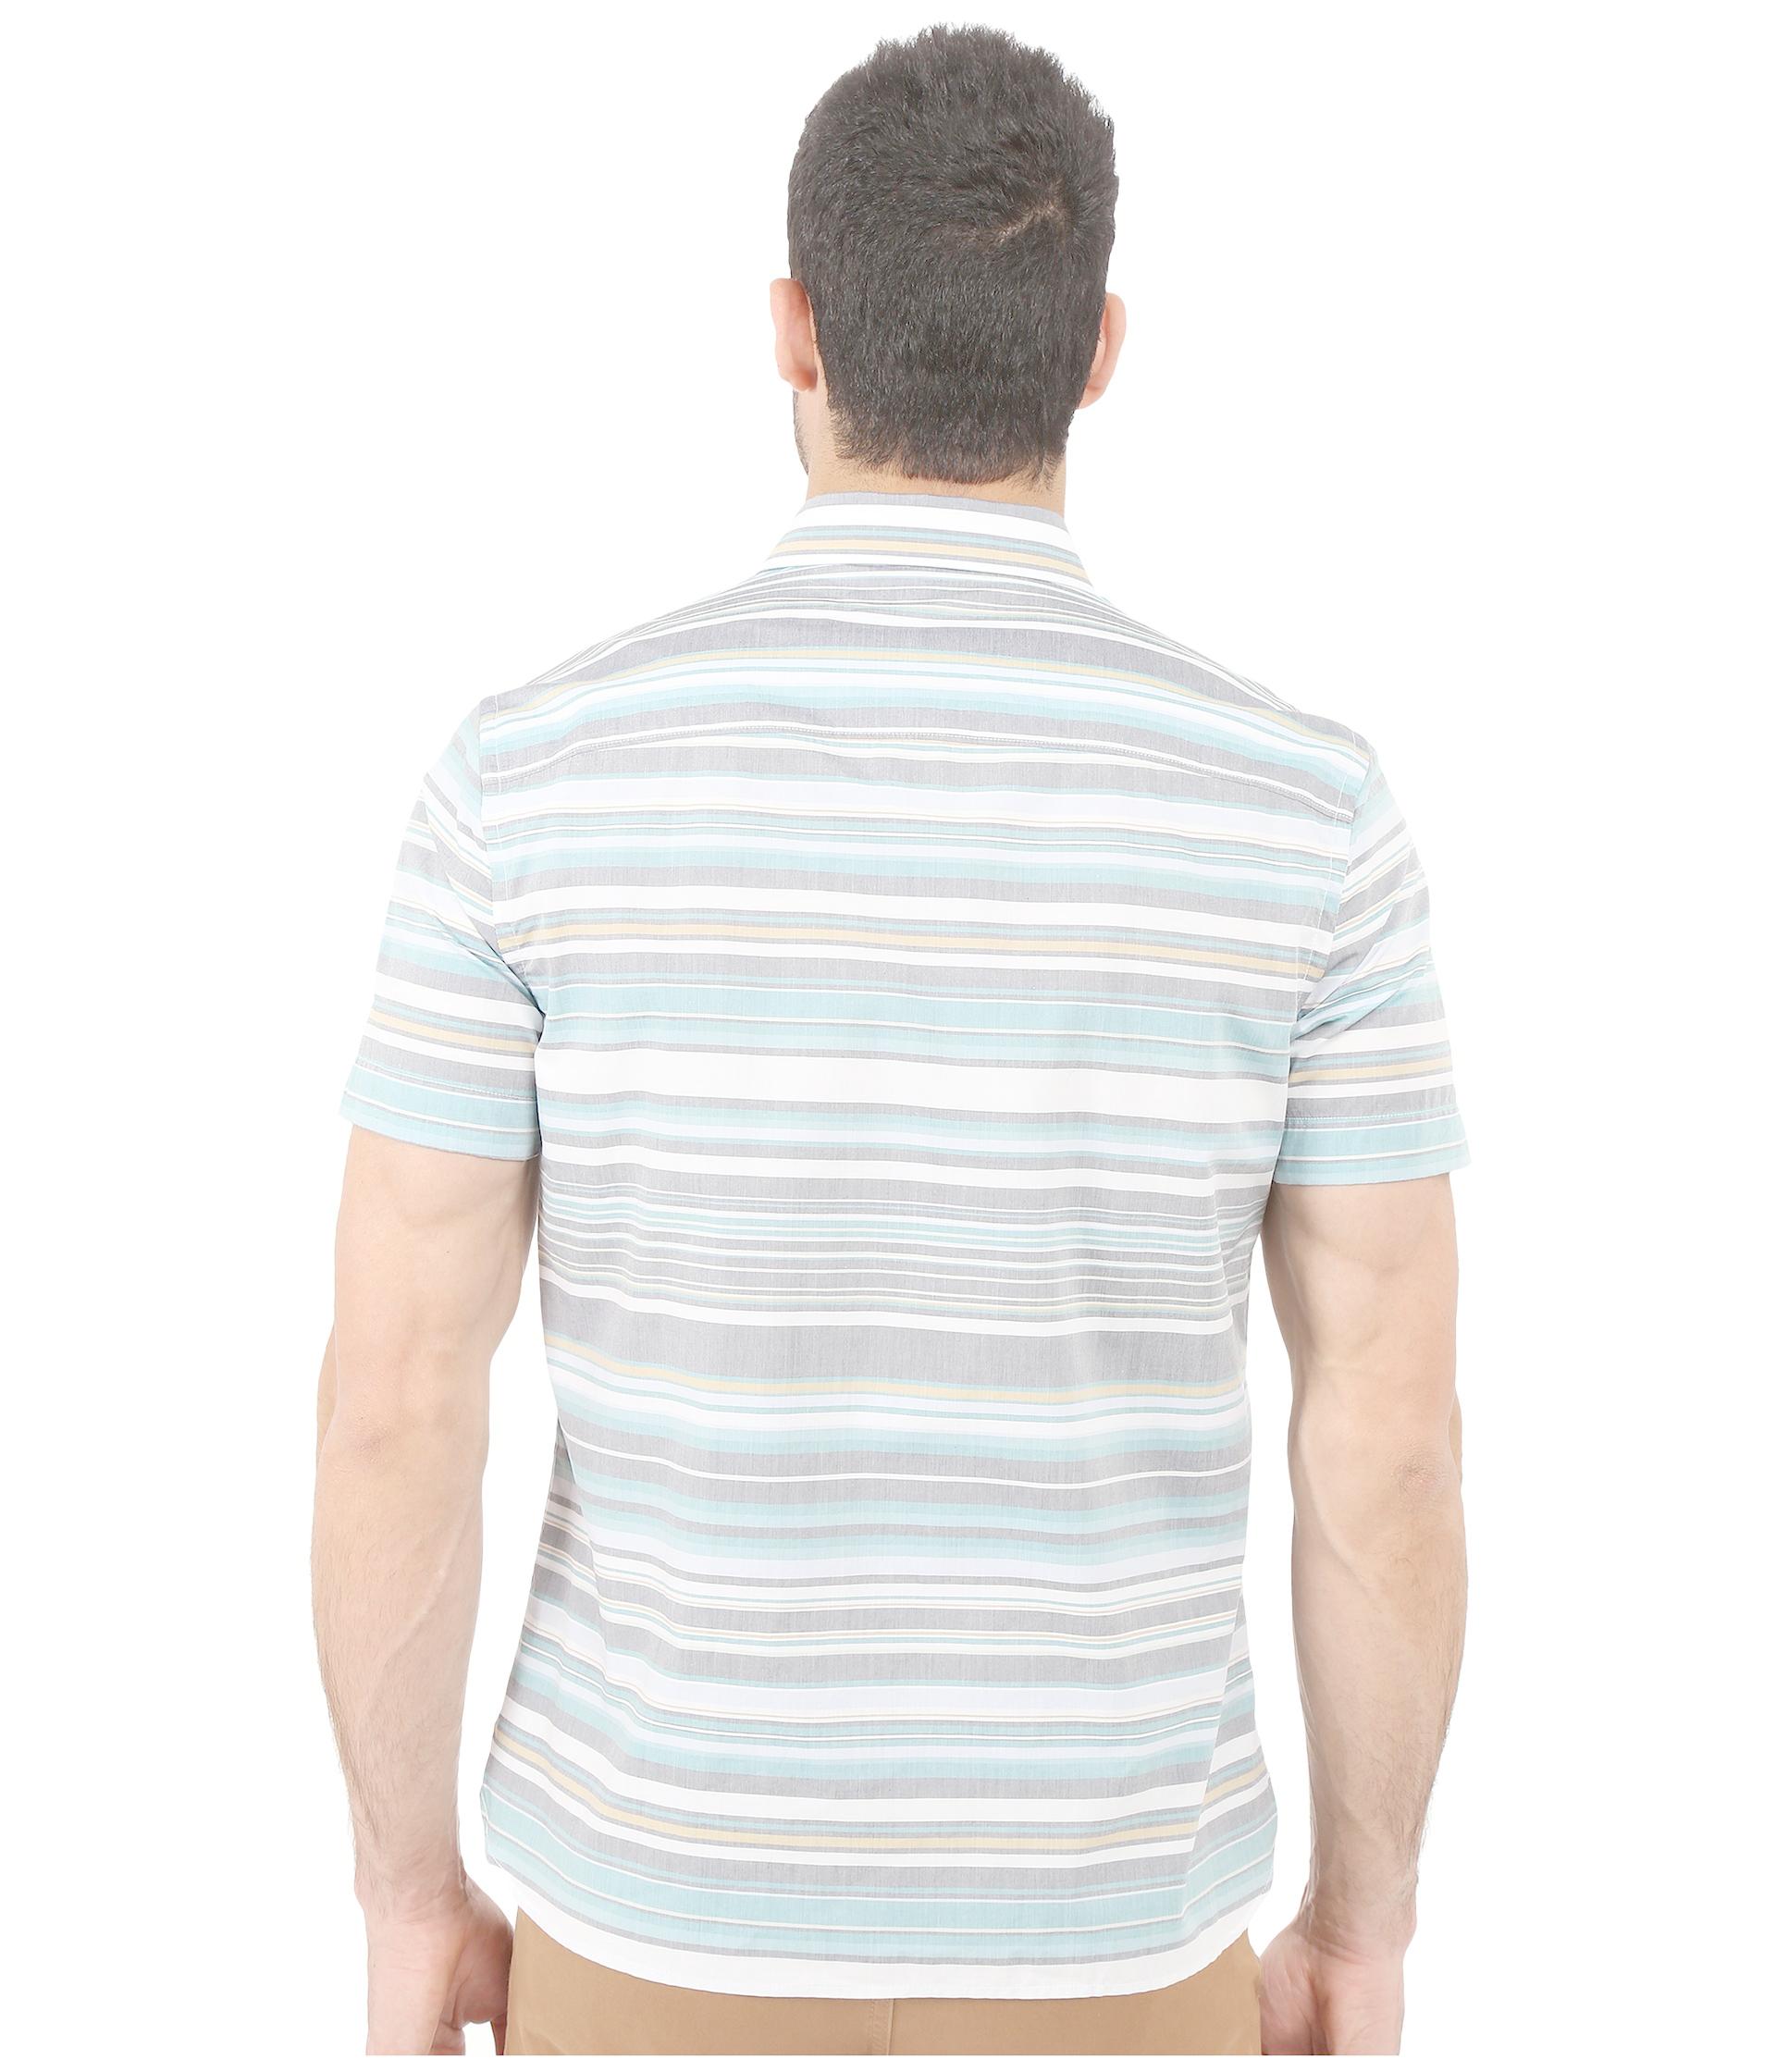 Perry Ellis Regular Fit Multicolor Stripe Pattern Shirt In